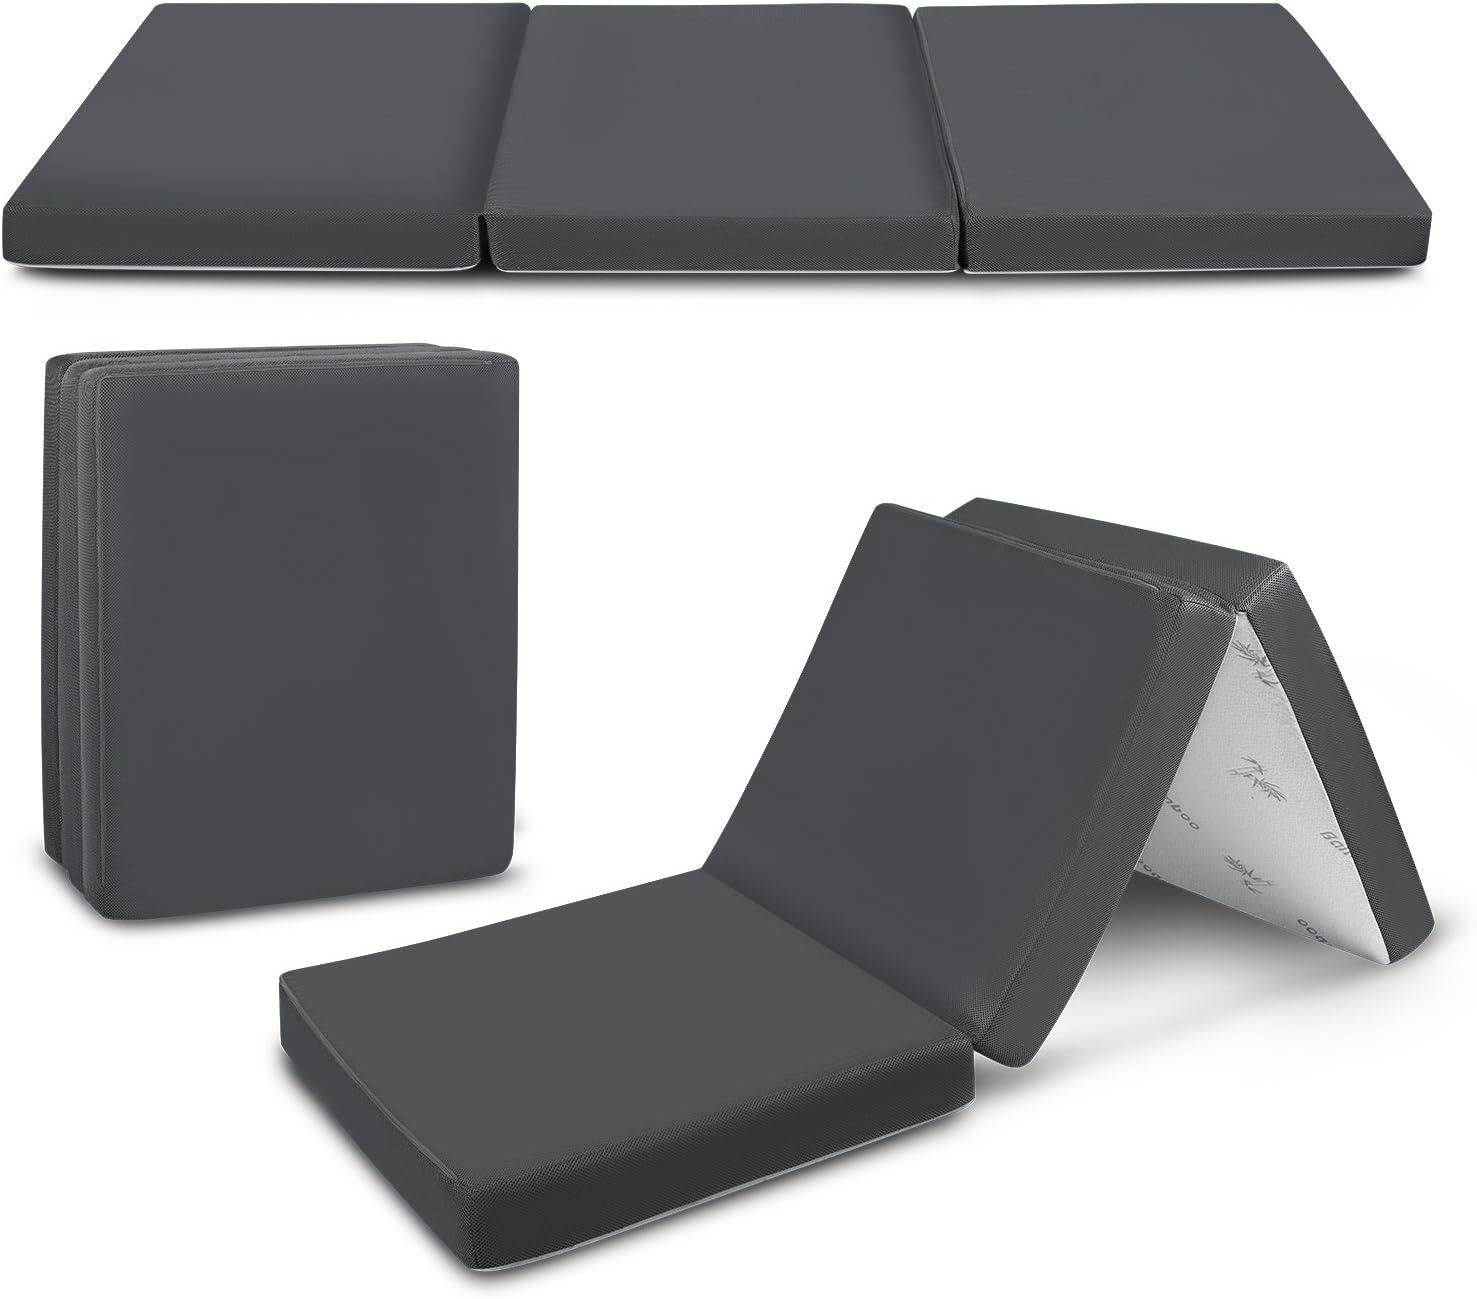 - Amazon.com : Cozzzi Folding Mattress - Trifold Foam Mattress